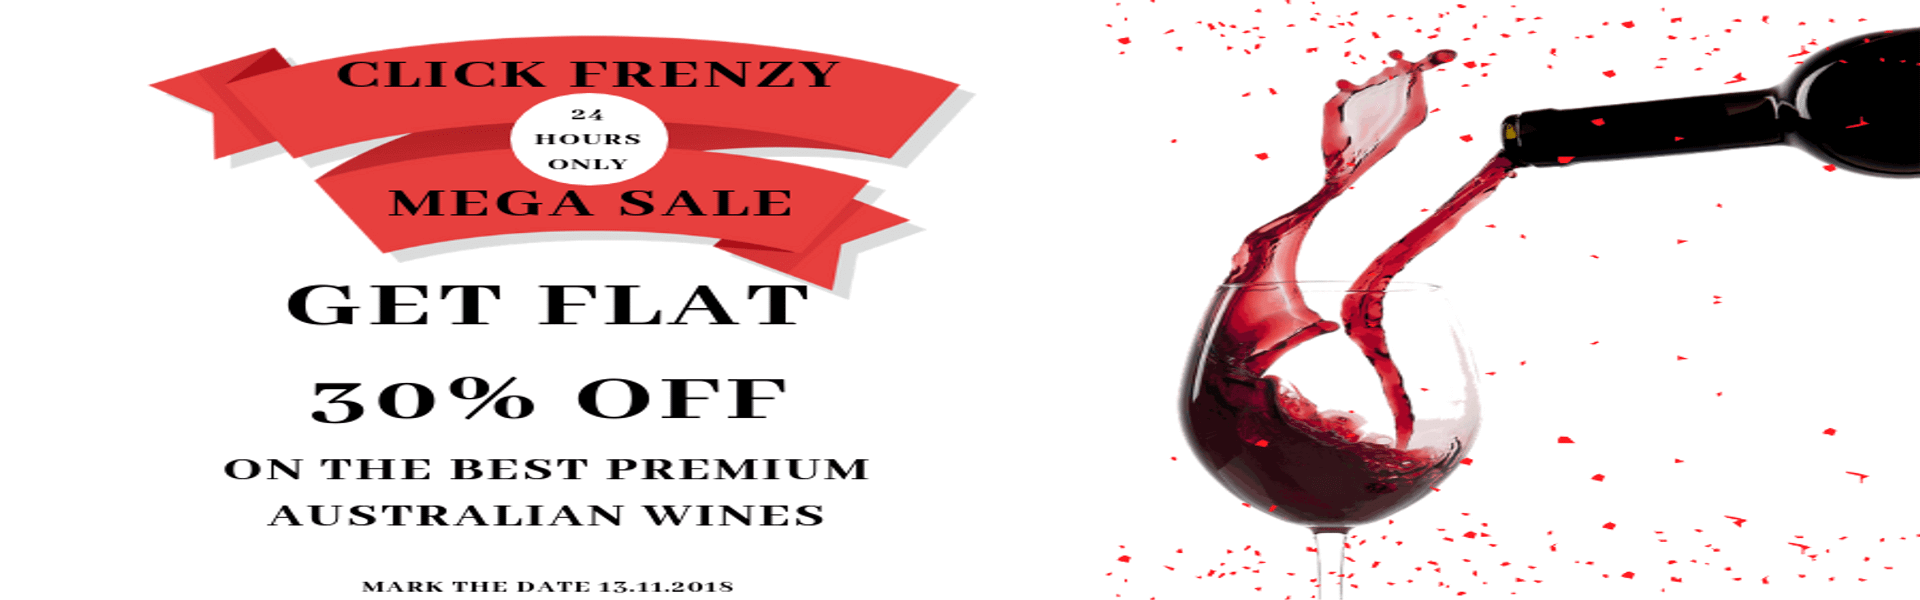 Click Frenzy - SA Wines (1)